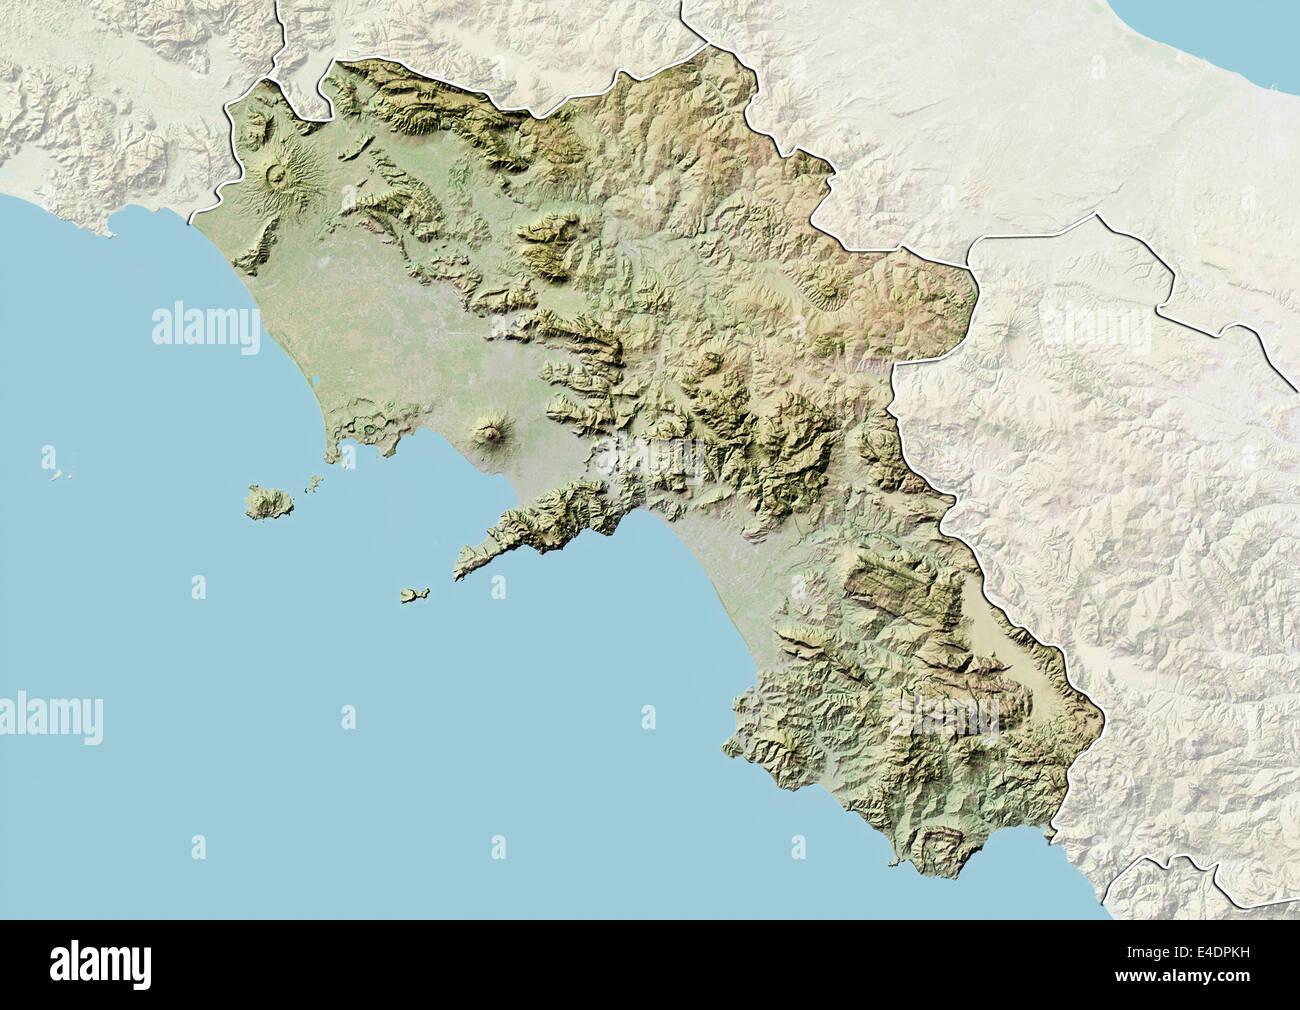 Region of Campania, Italy, Relief Map Stock Photo: 71603269 - Alamy